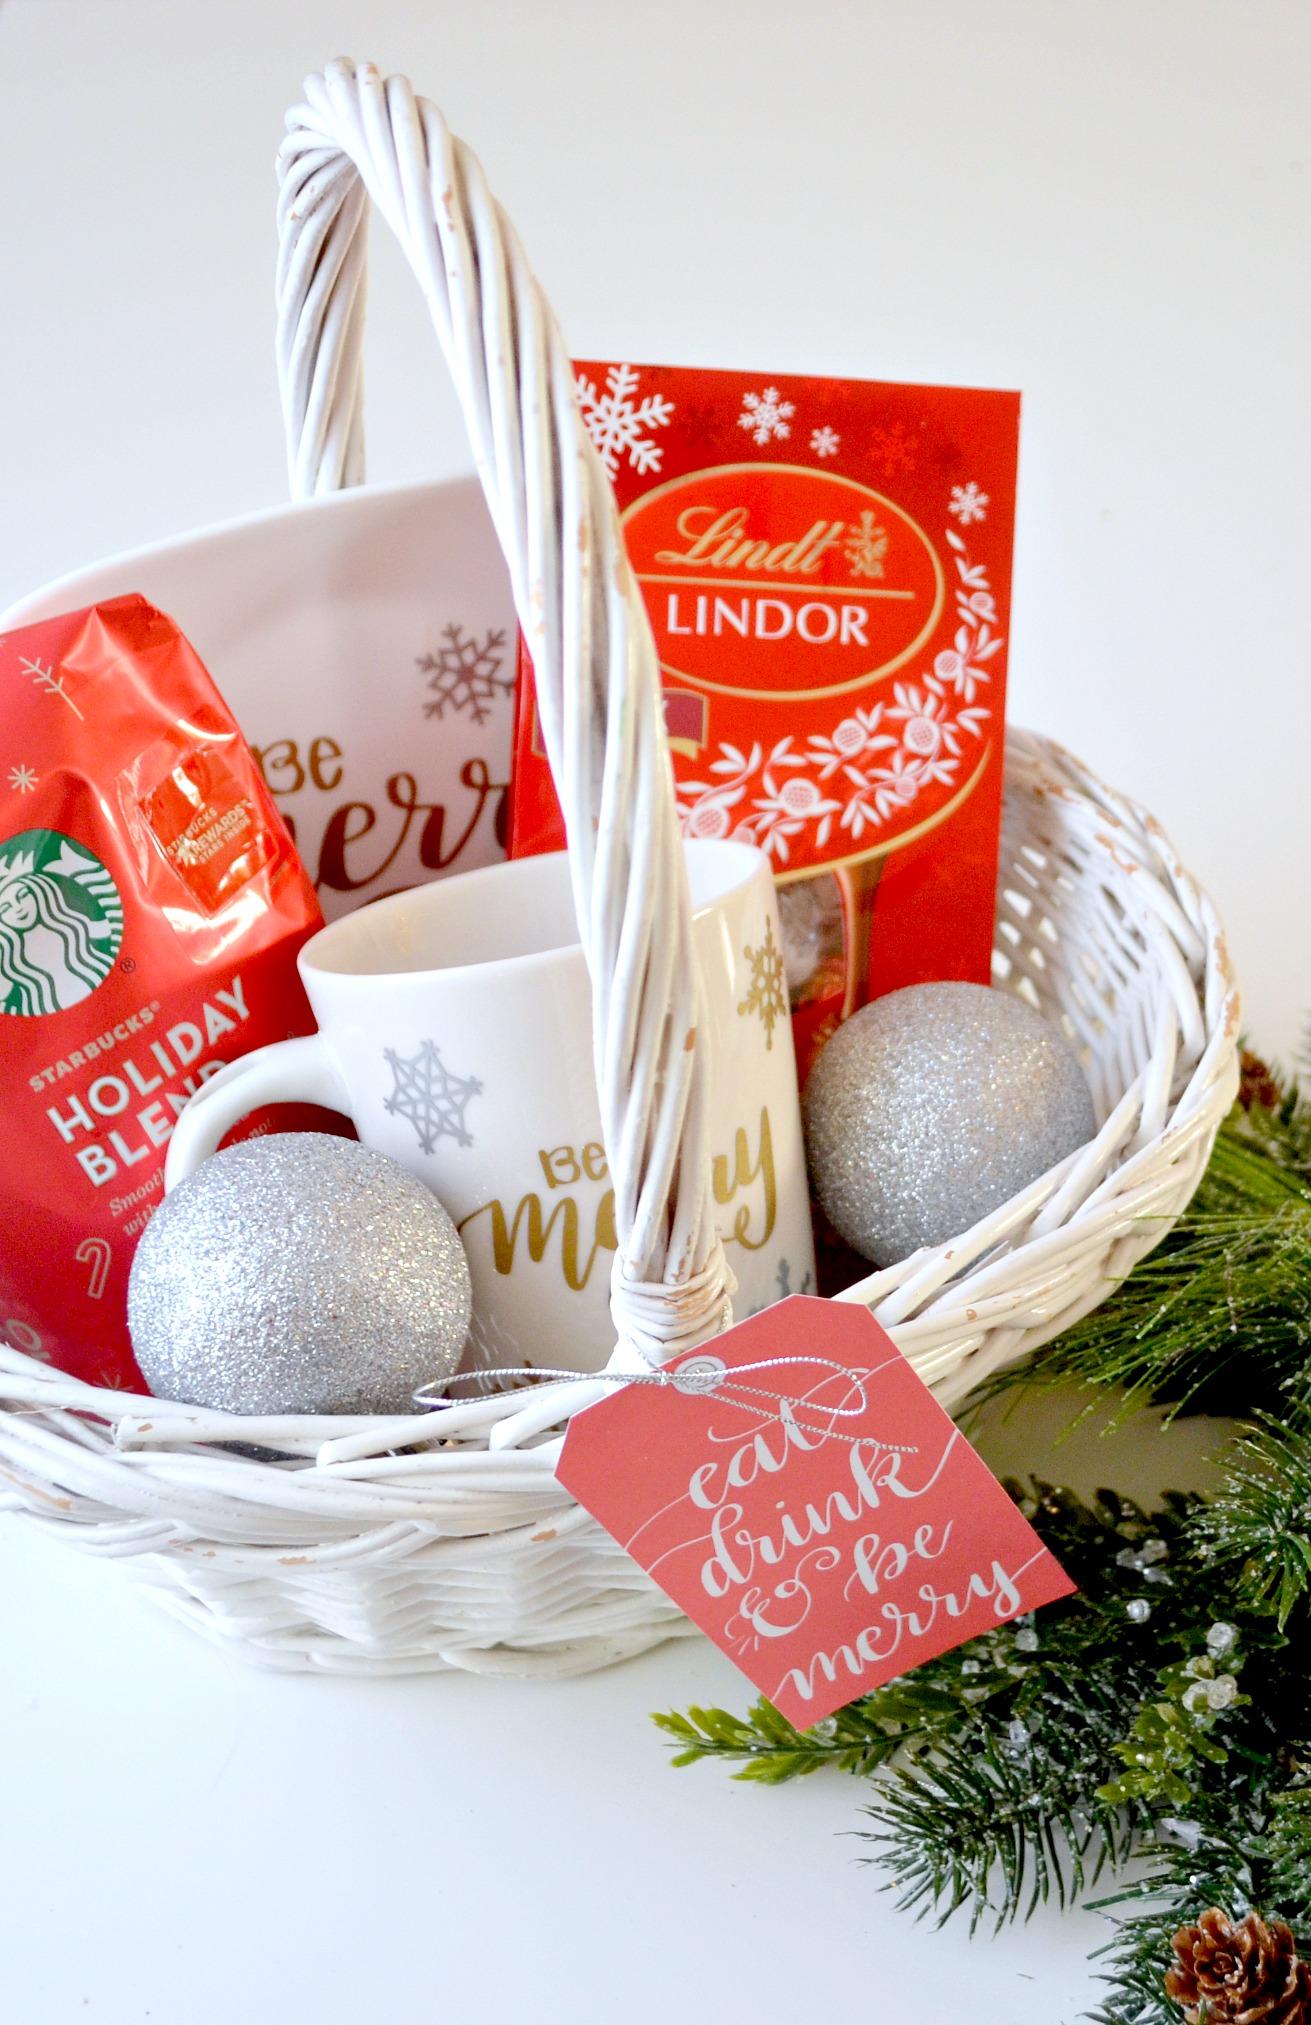 starbucks and lindt coffee chocolate christmas gift basket